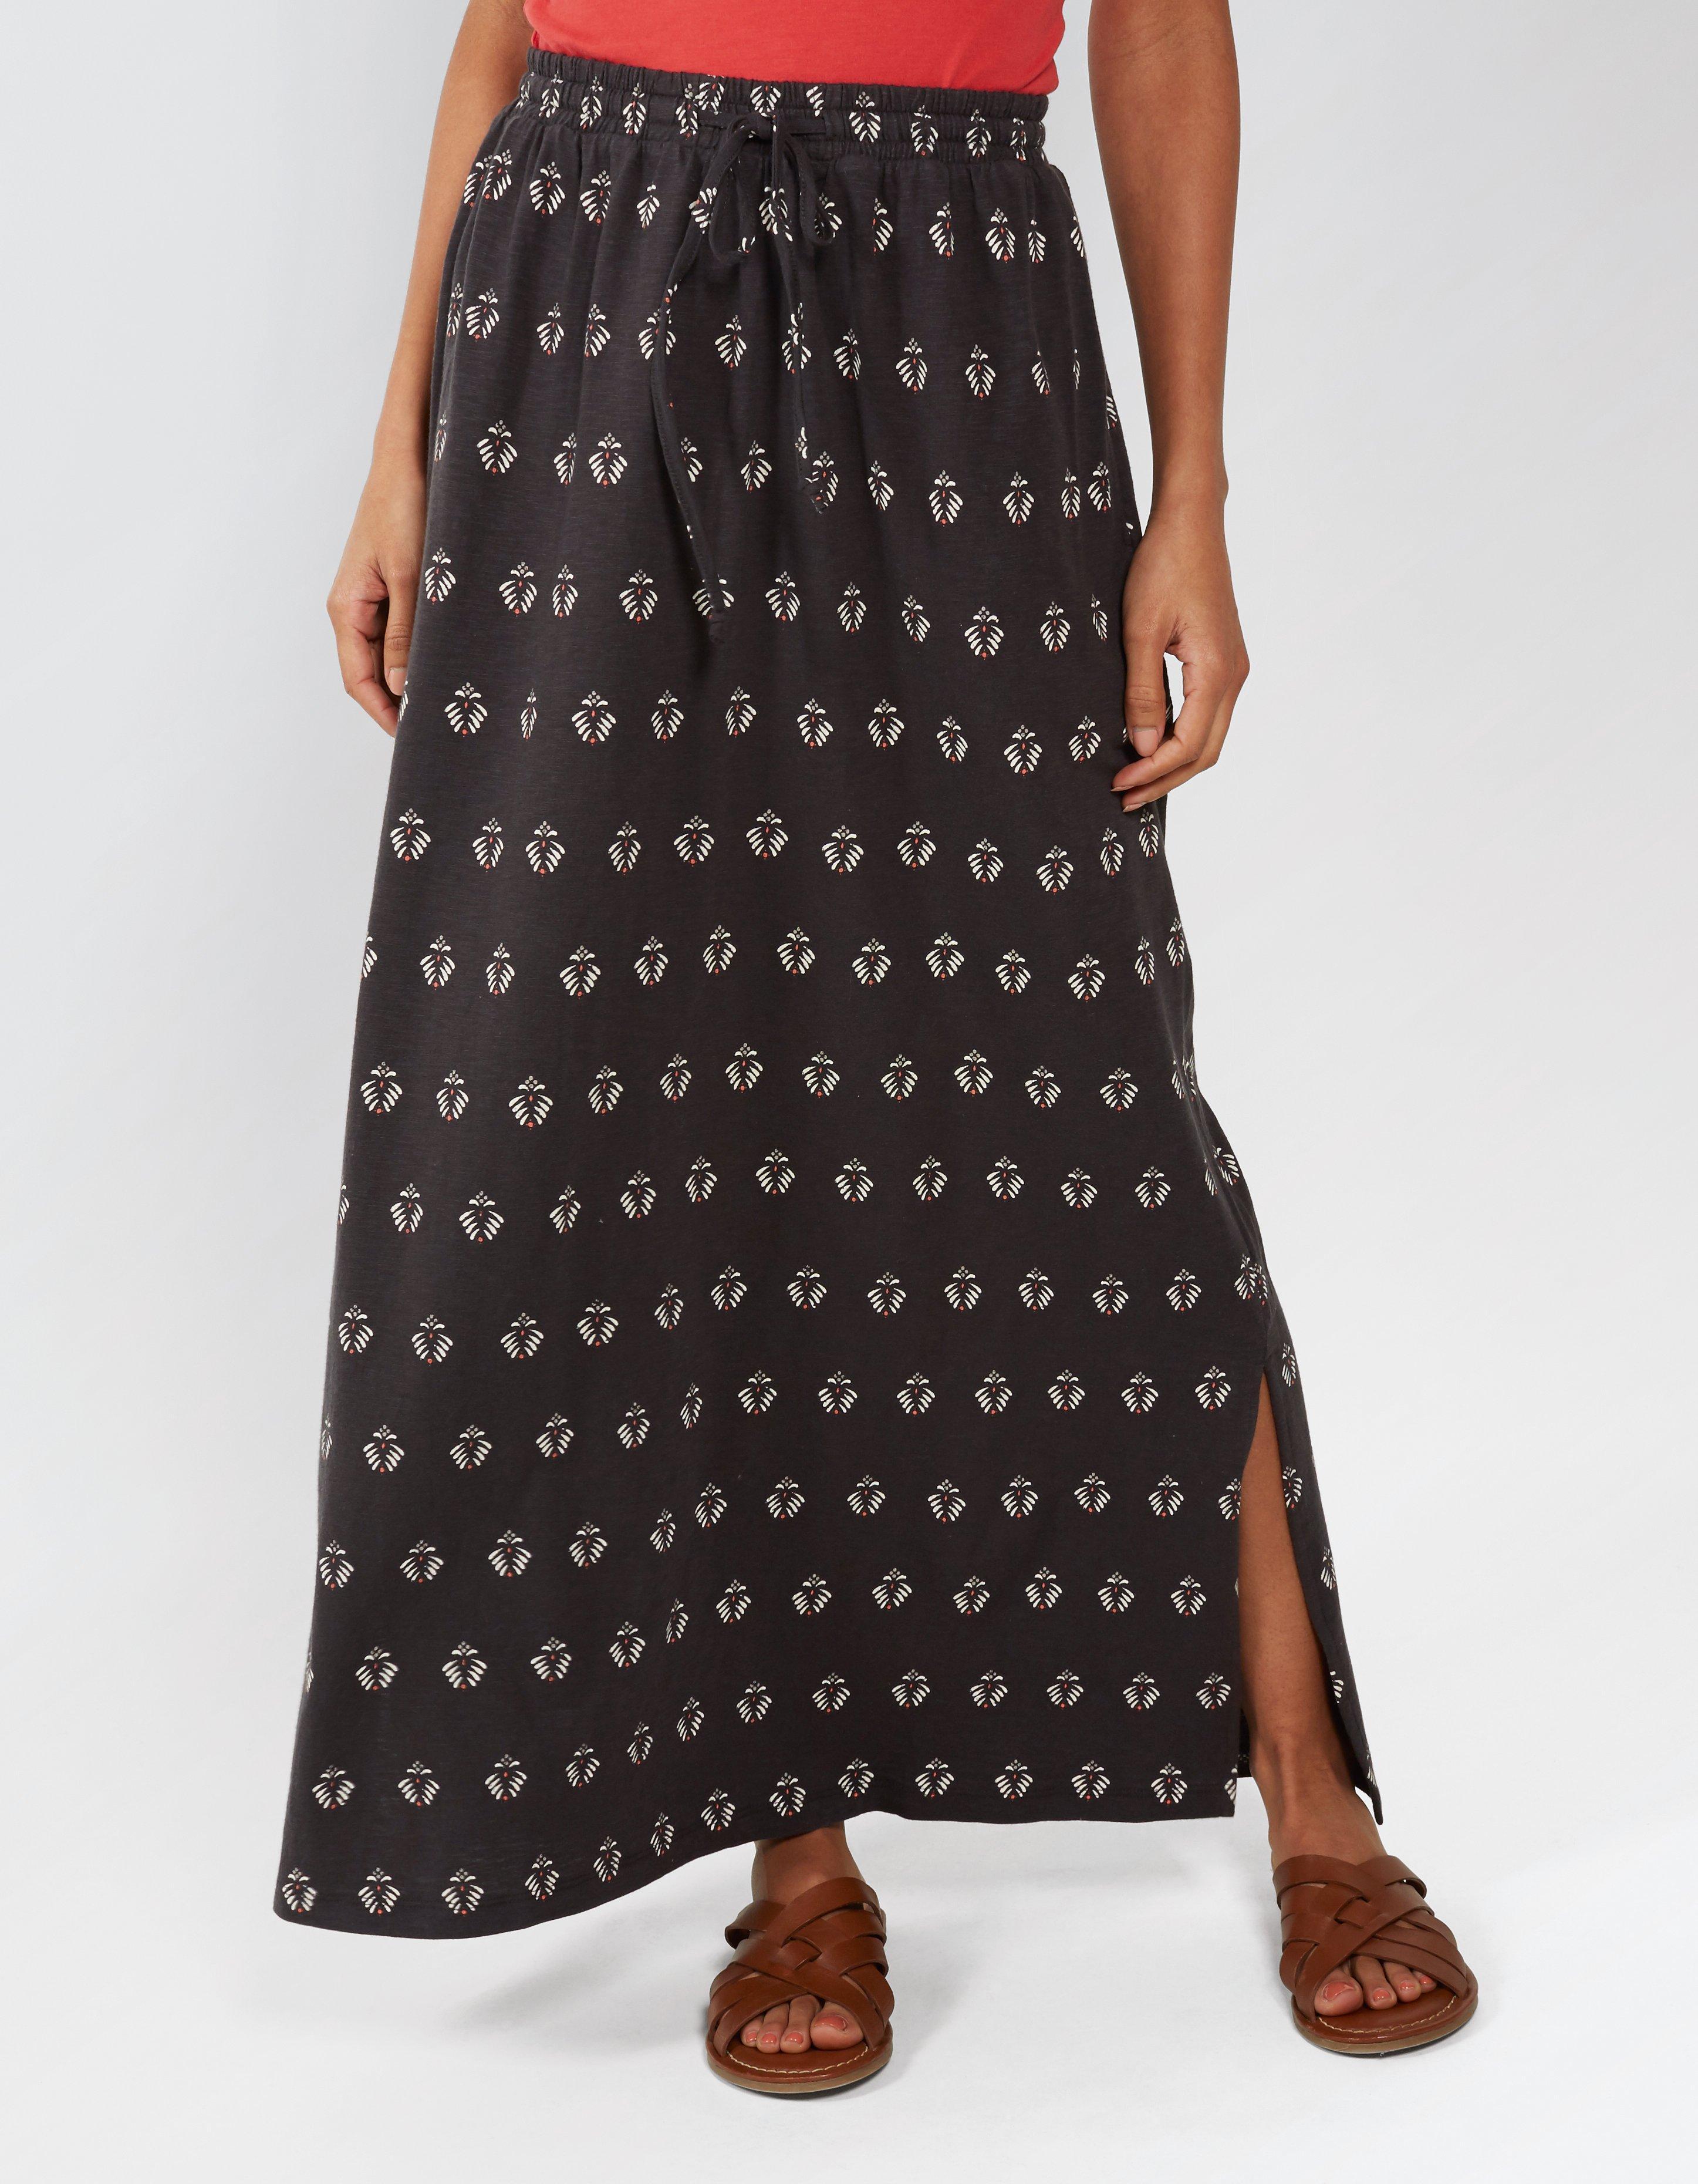 Jessica Gem Geo Maxi Skirt